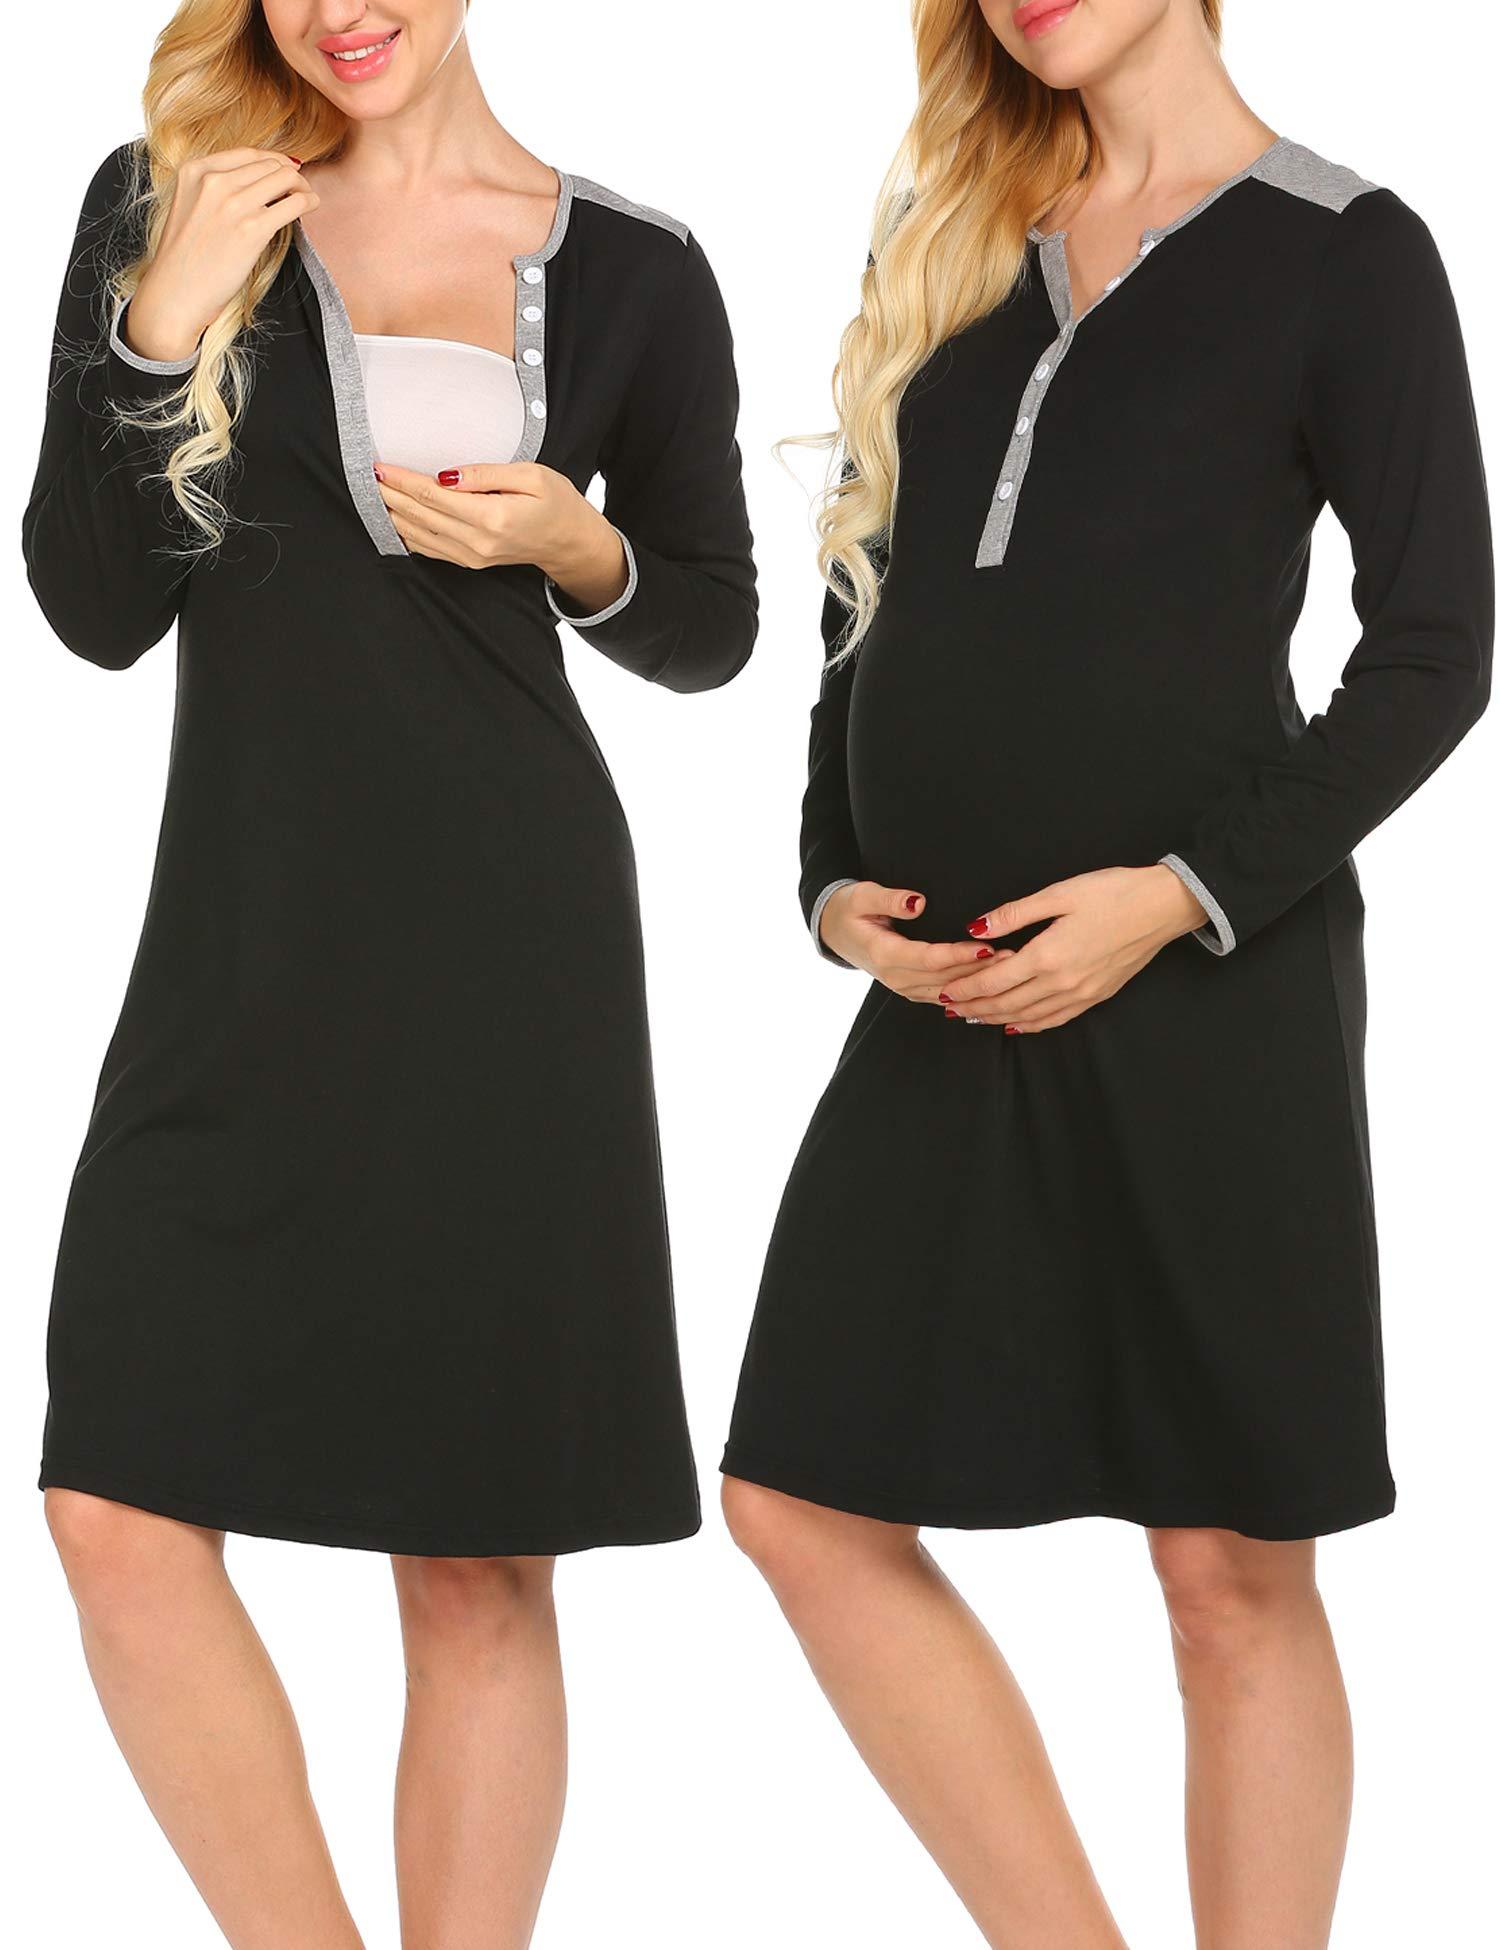 bf86b3b8017cb Nursing StrabElla Womens Maternity Breastfeeding Dress Short Sleeve Nursing  Nightgown for Nightshirt Sleepwear Tops